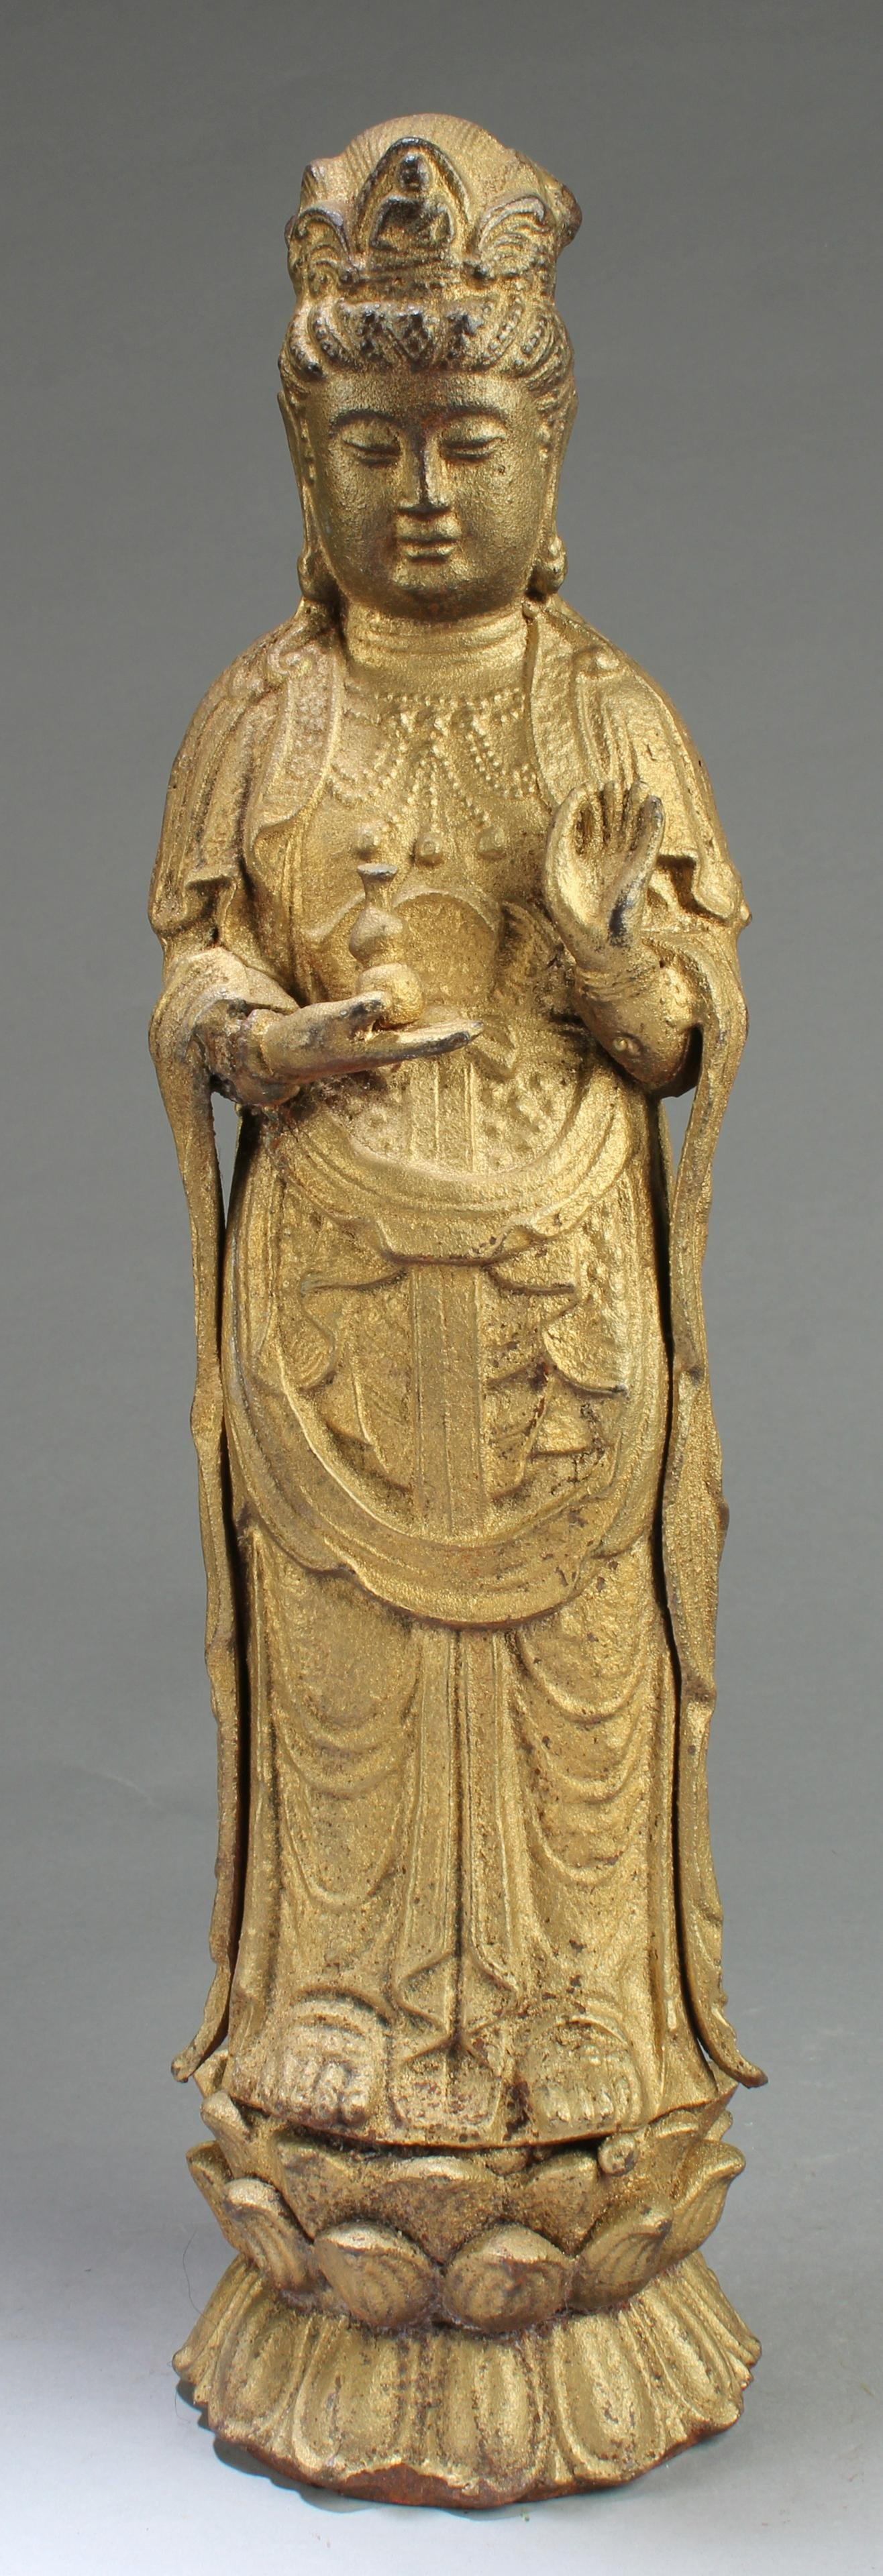 One Cast Iron Bodhisattva Statue